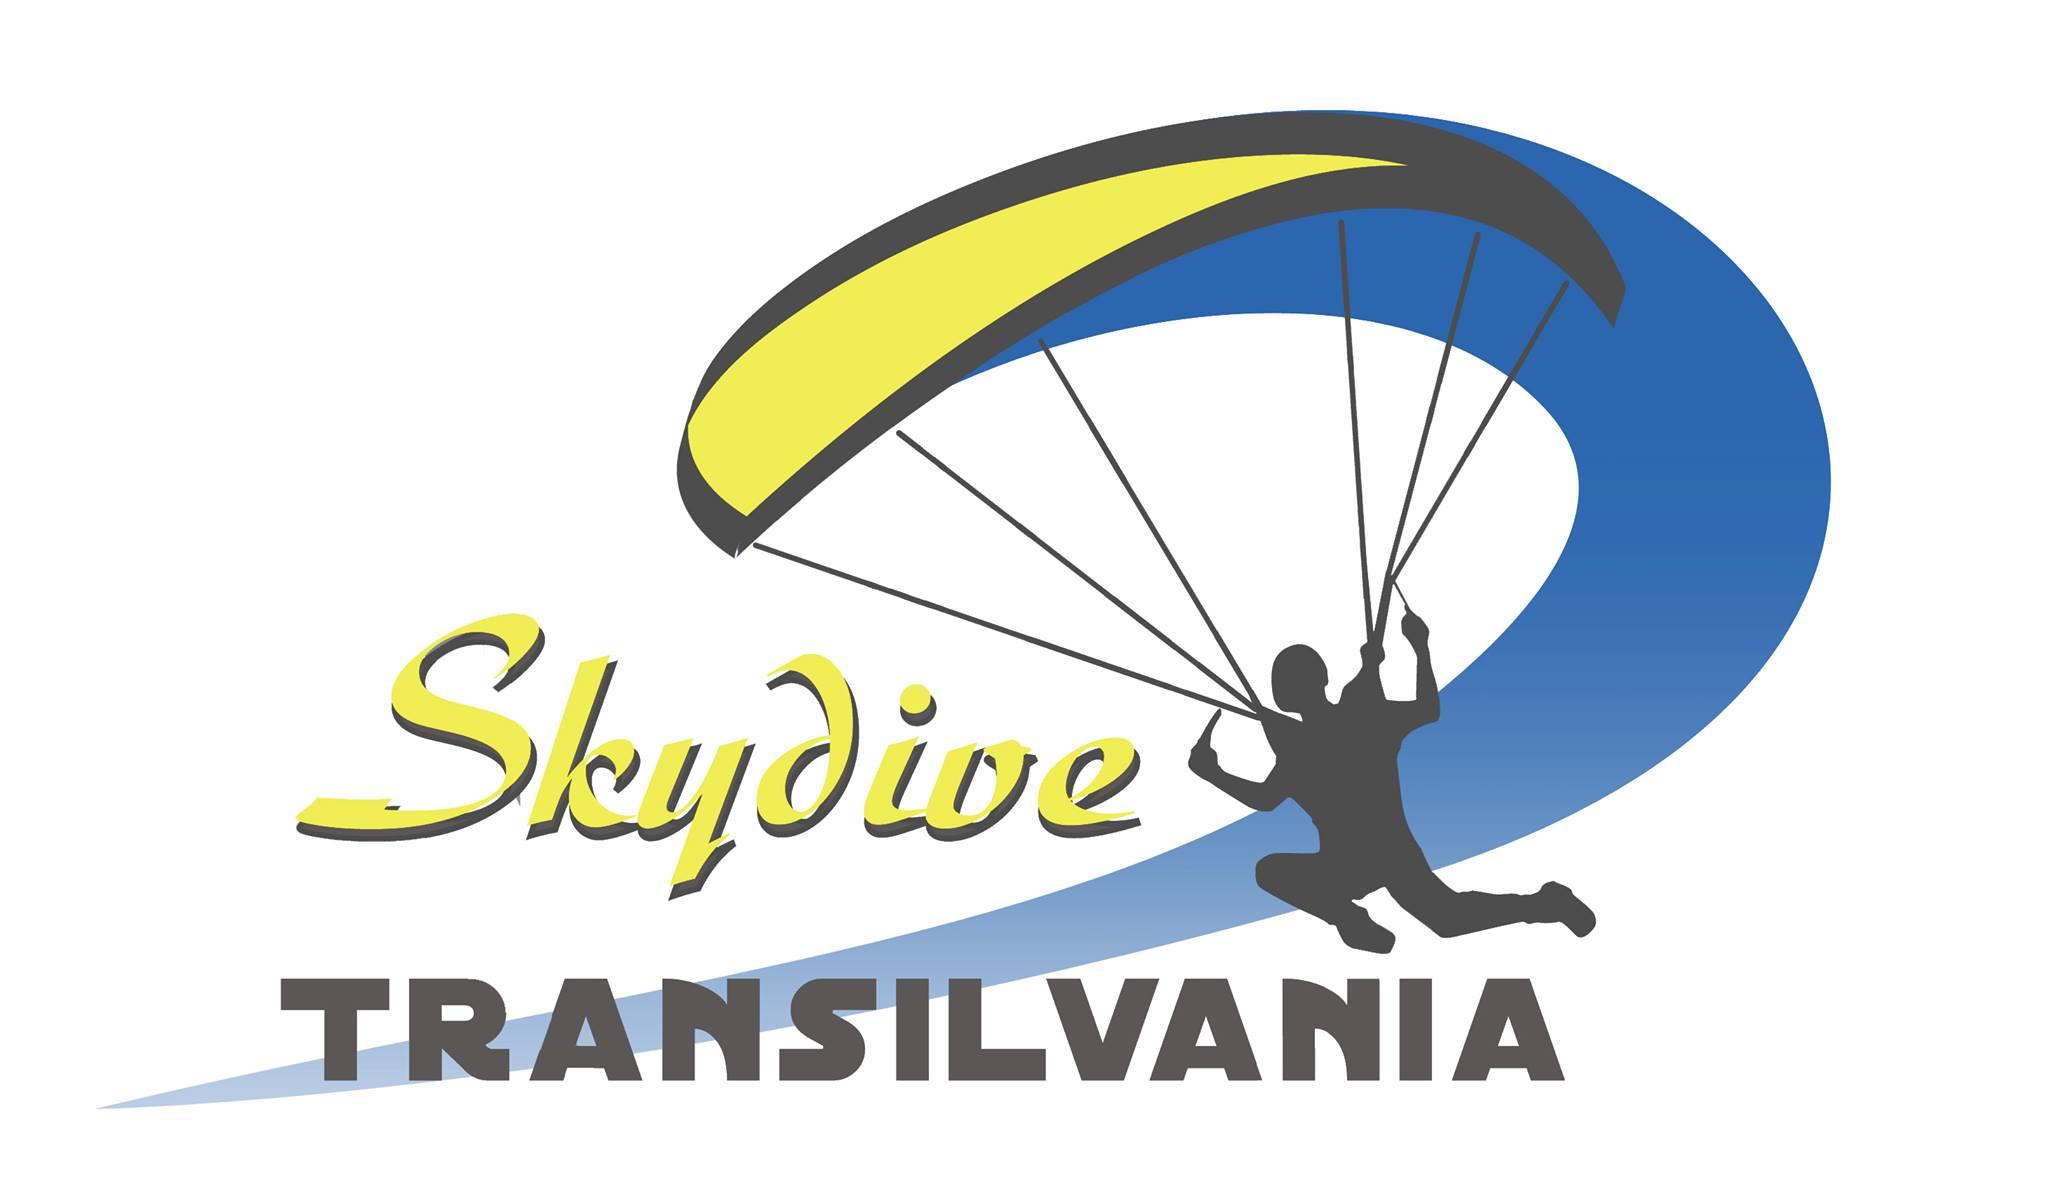 Asociația Club Sportiv Skydive Transilvania logo